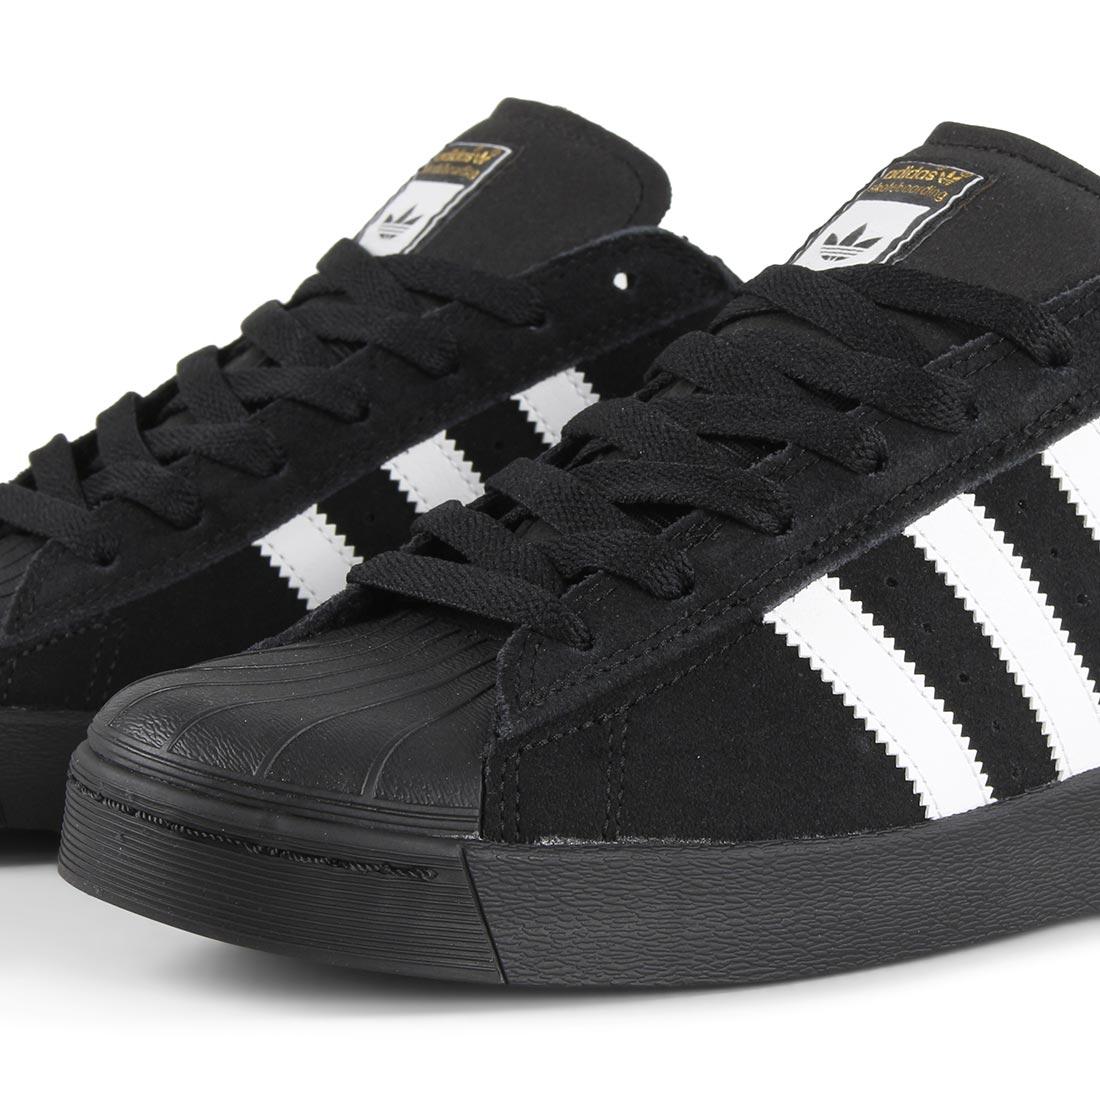 Adidas Superstar Vulc ADV Shoes - Core